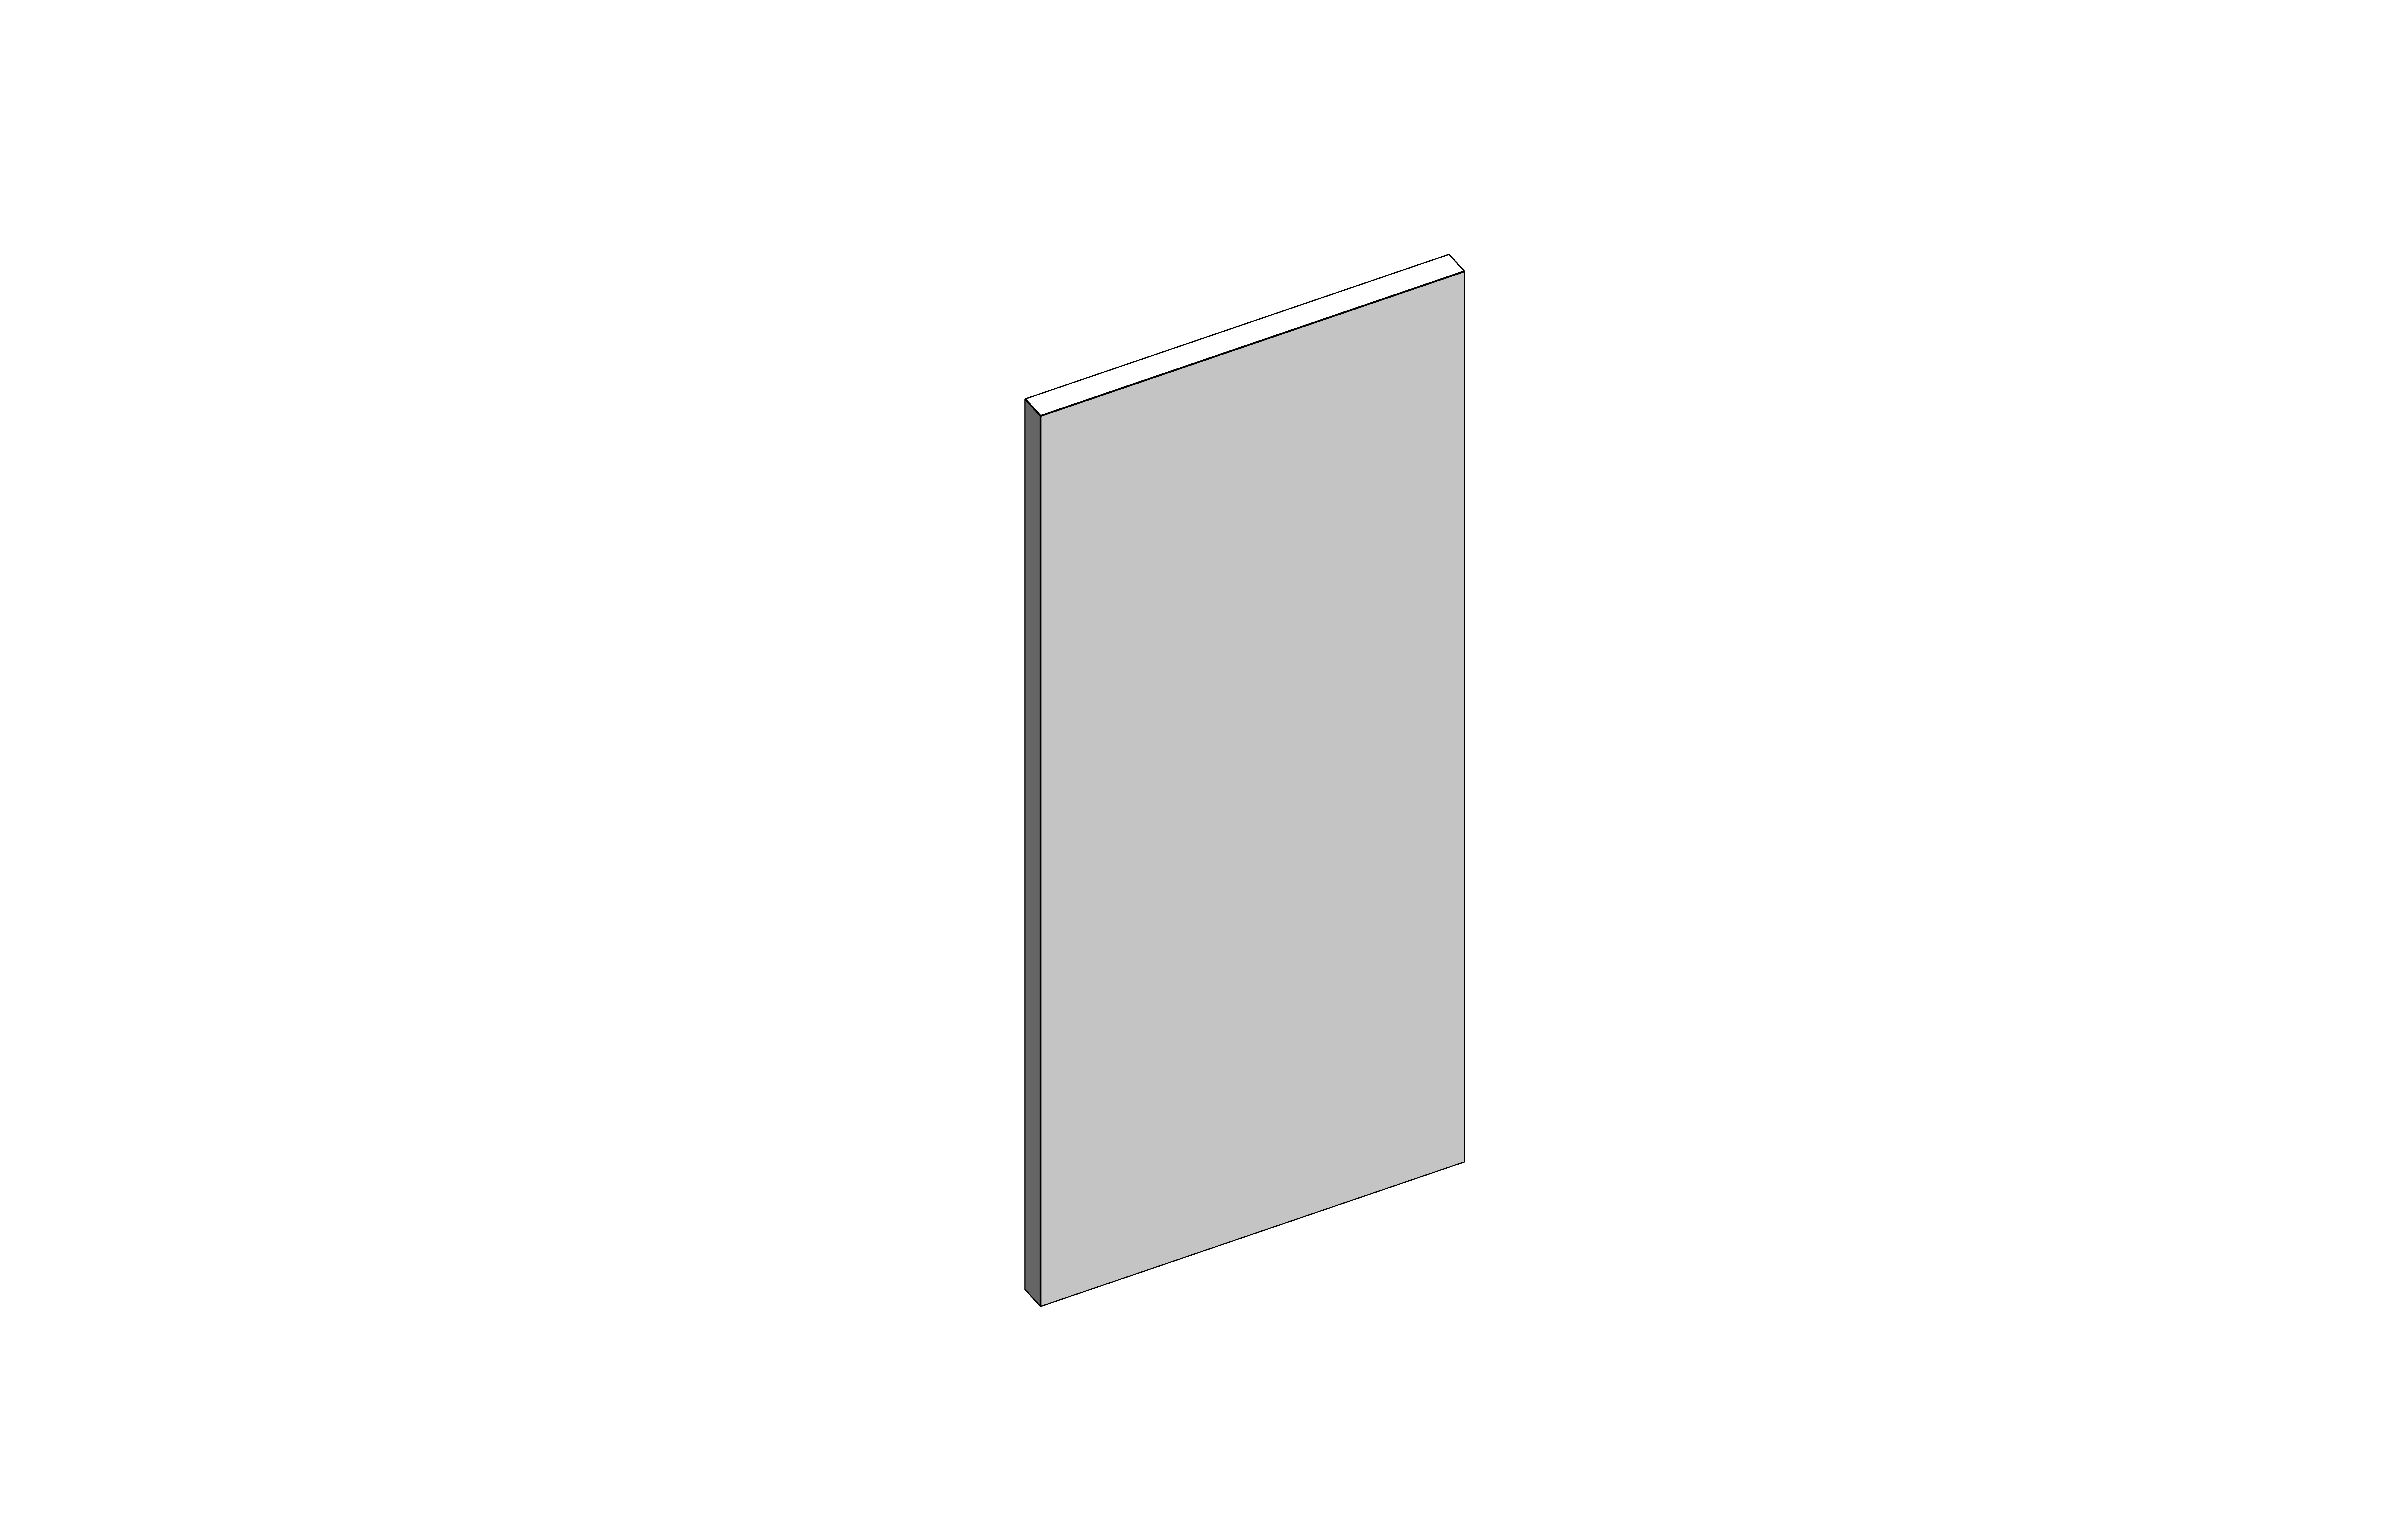 1002 m2 Steel Frame Walls